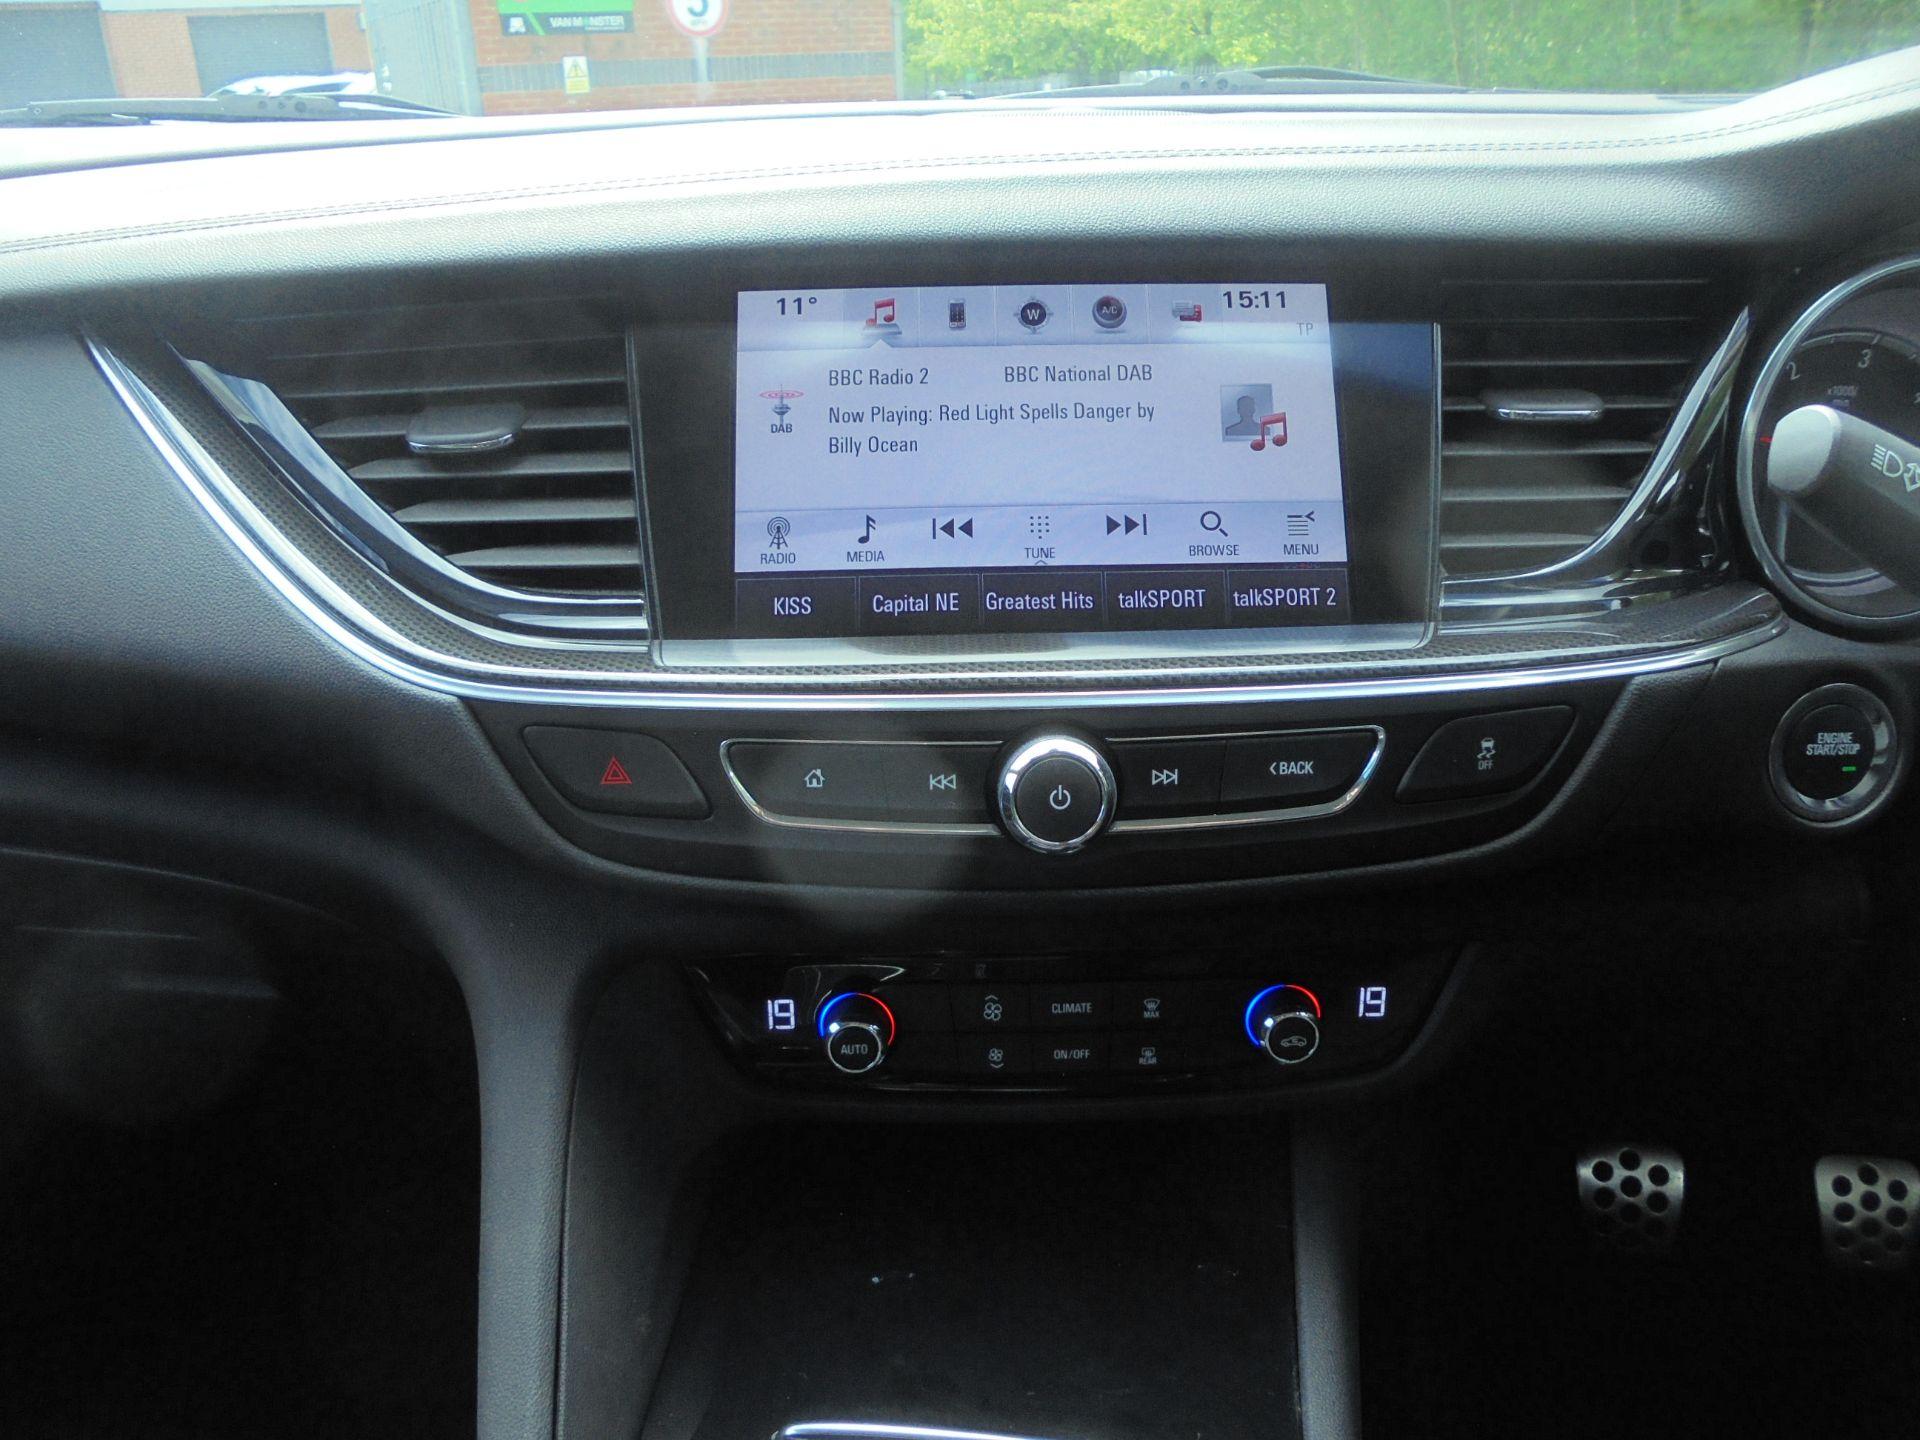 2018 Vauxhall Insignia Grand Sport 1.6 Turbo D Ecotec [136] Sri Nav 5Dr (VU18DFF) Image 19